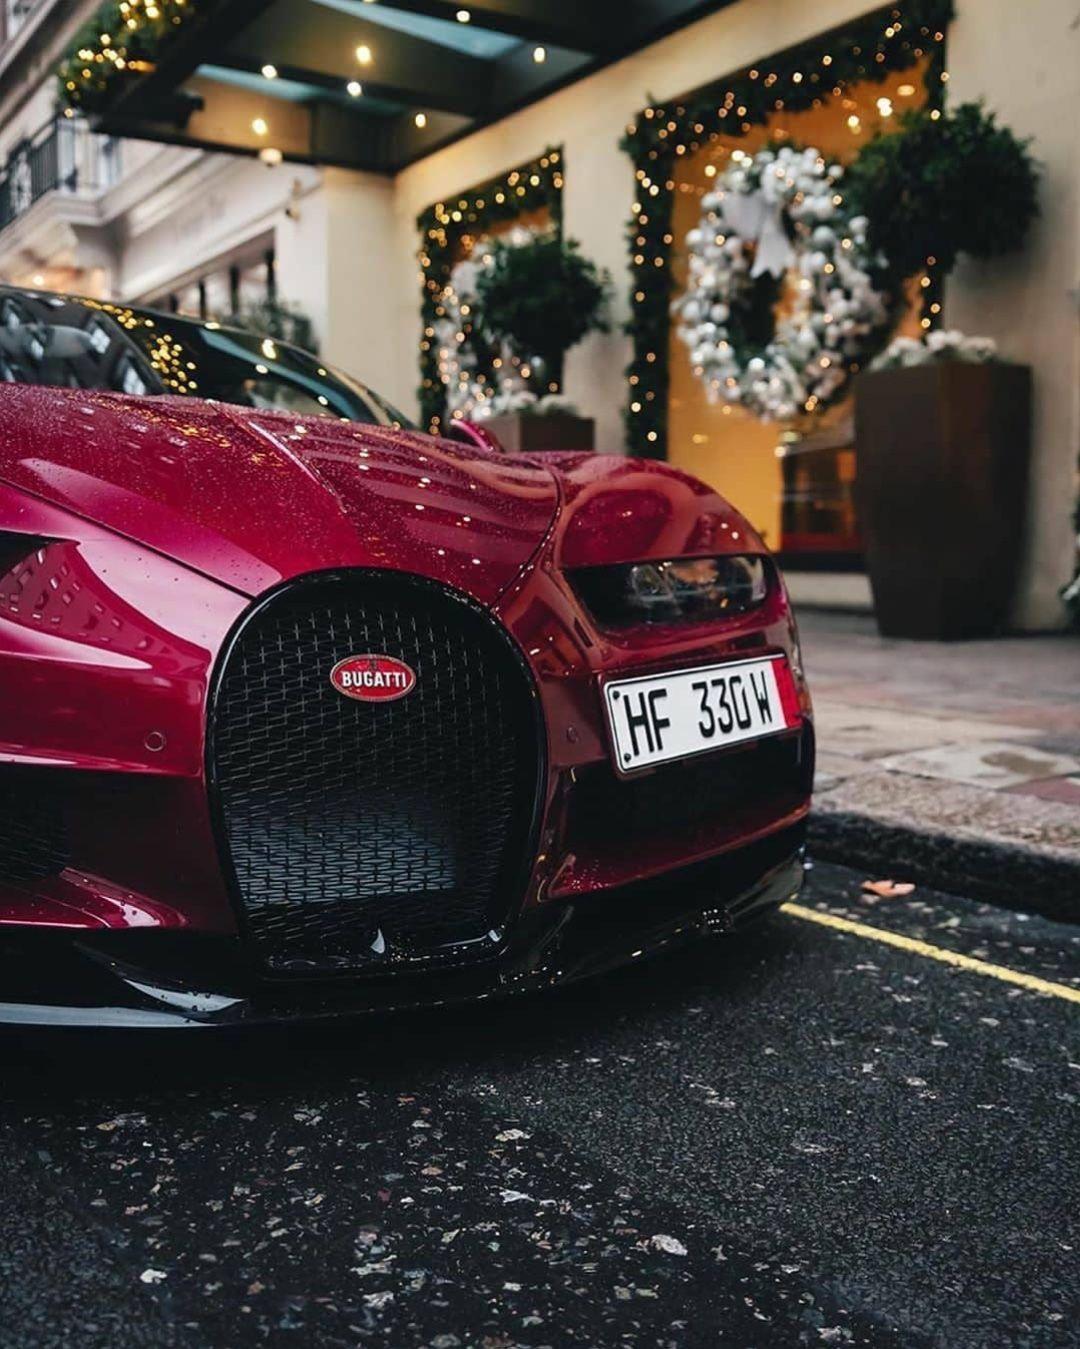 Bugatti Chiron in 2020 (With images)   Bugatti, Bugatti chiron, Sports cars luxury